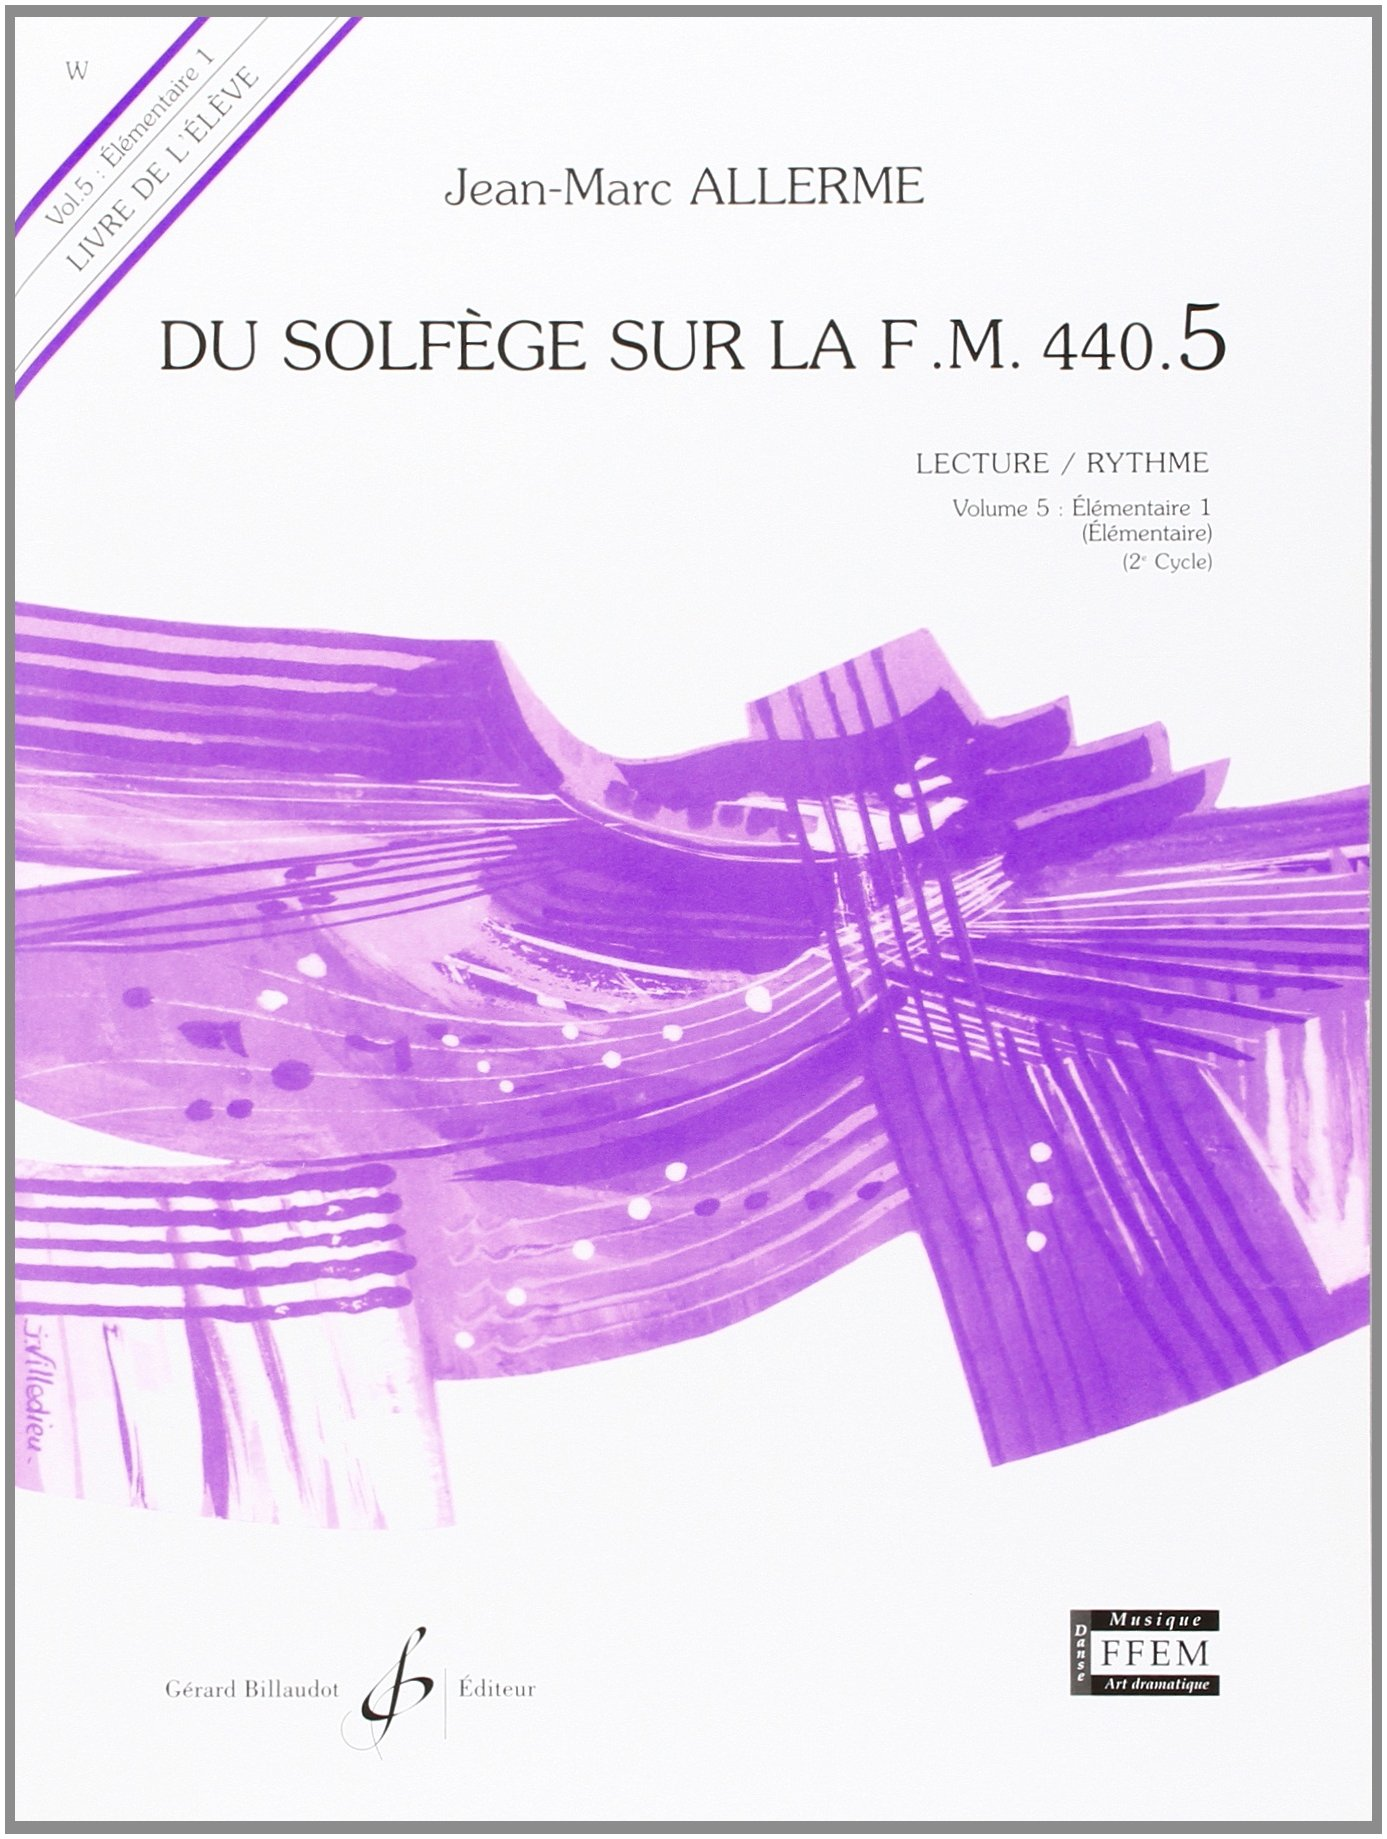 Du Solfege Sur la F.M. 440.5 - Lecture/Rythme - Eleve Broché – 1 janvier 2000 Allerme Jean-Marc Billaudot B003JYORYE